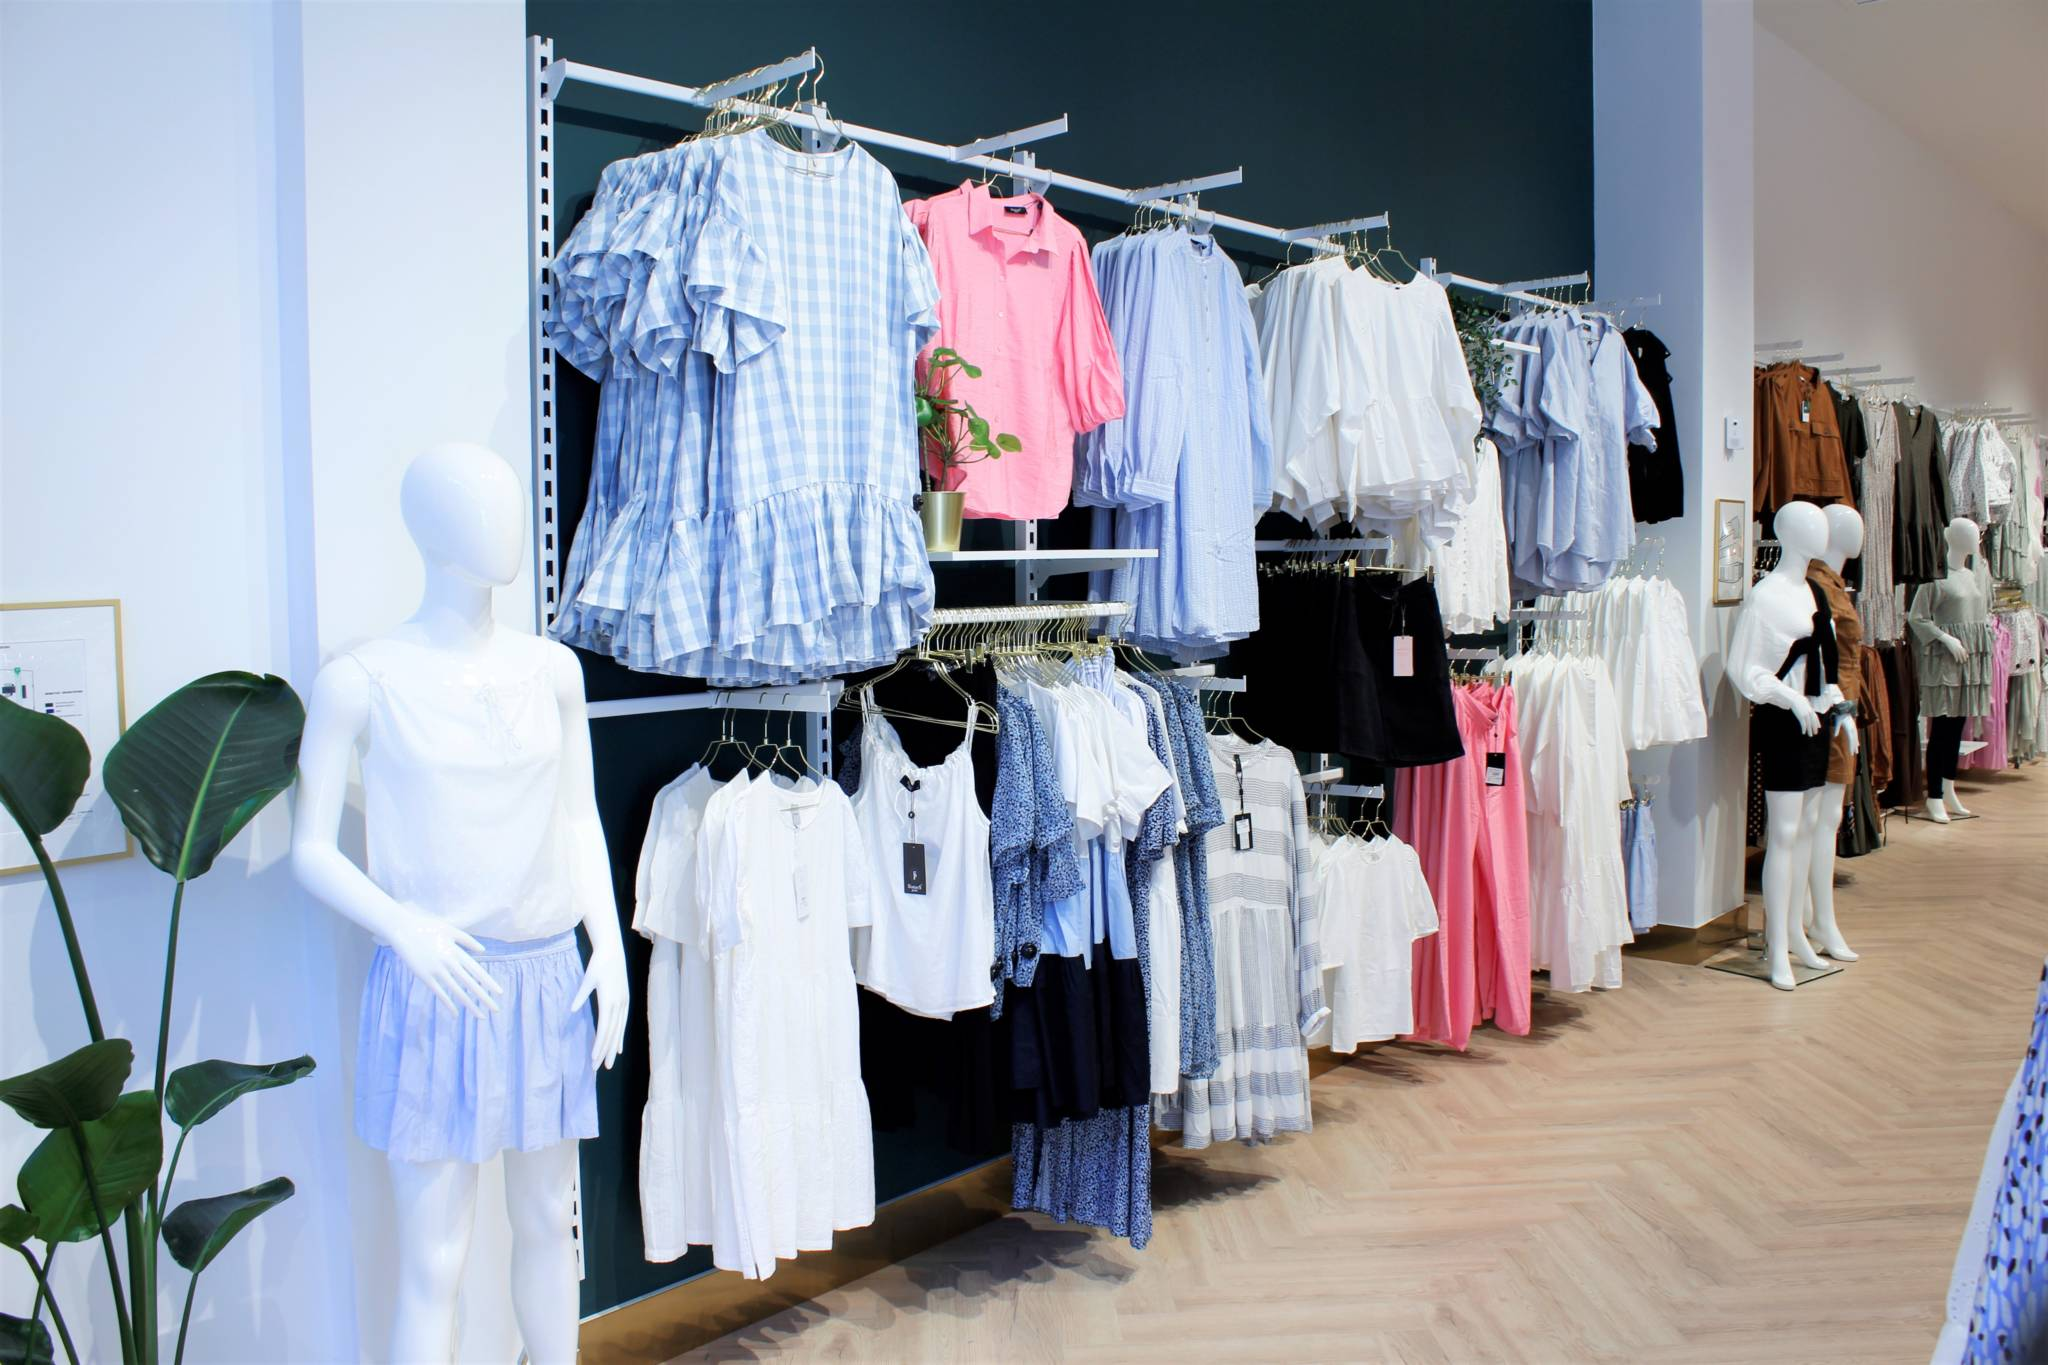 Hvidt butiksinventar